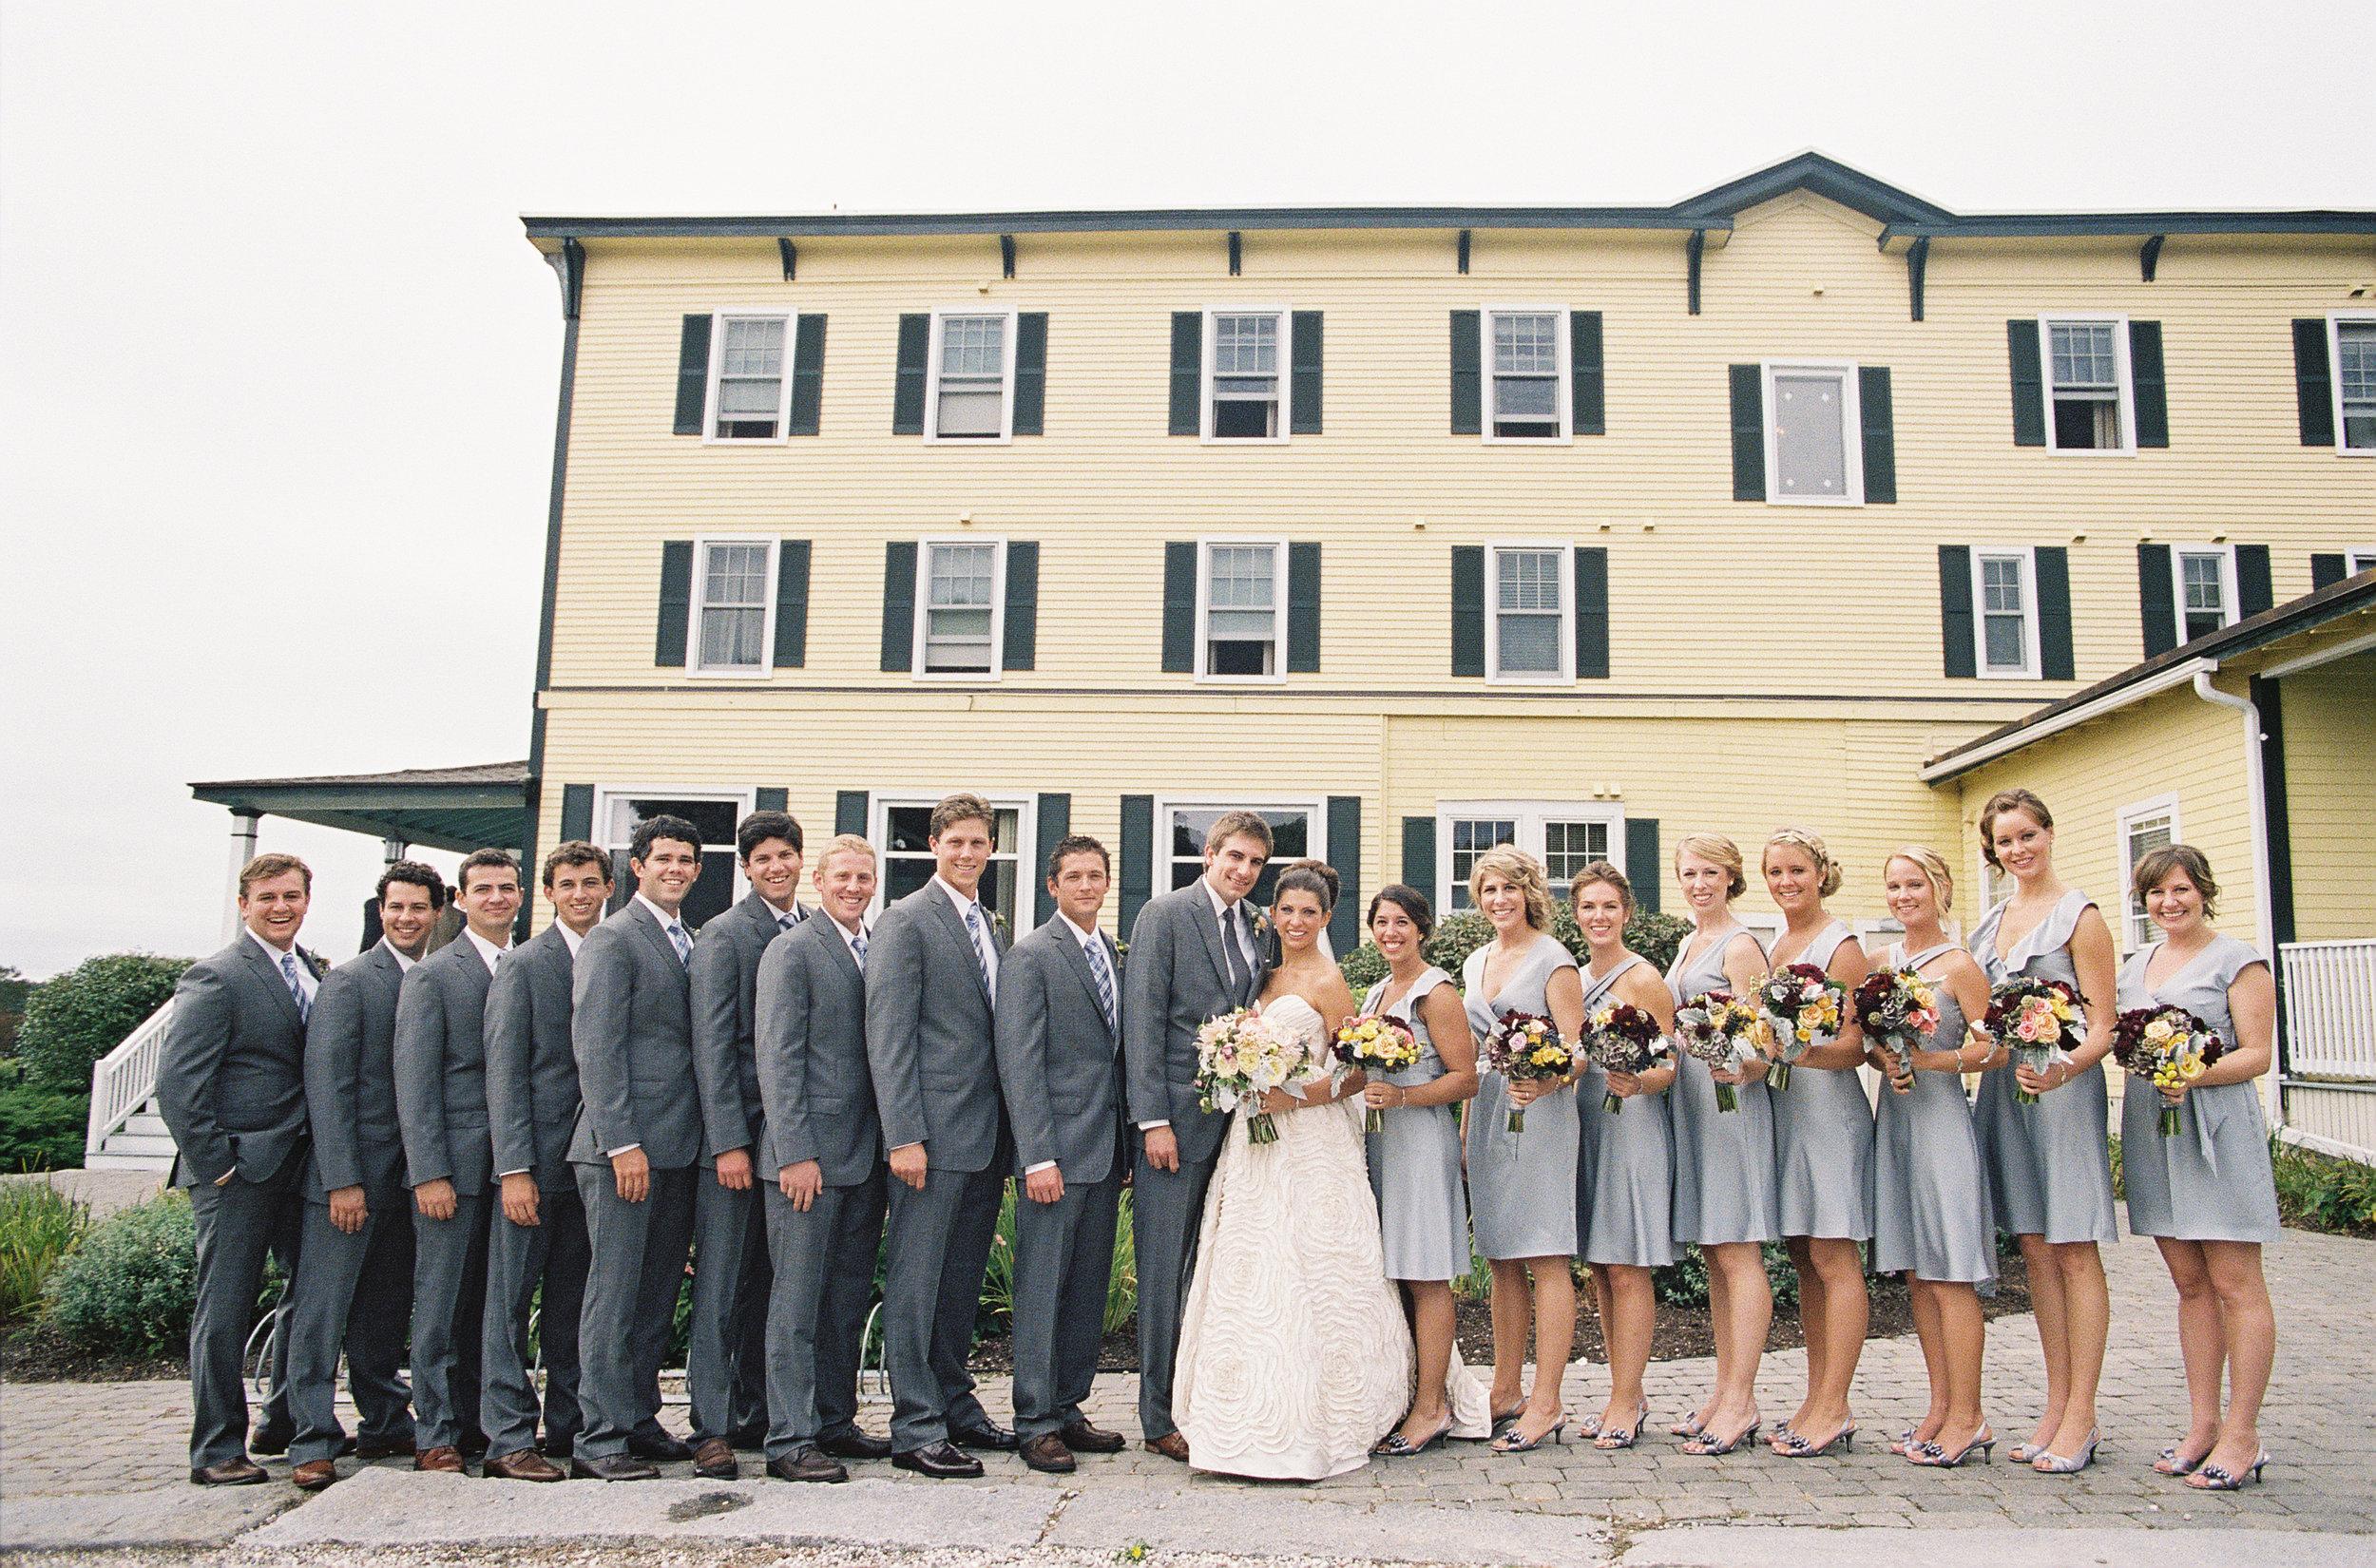 chebeague_island_inn_wedding_gabe_aceves017.JPG